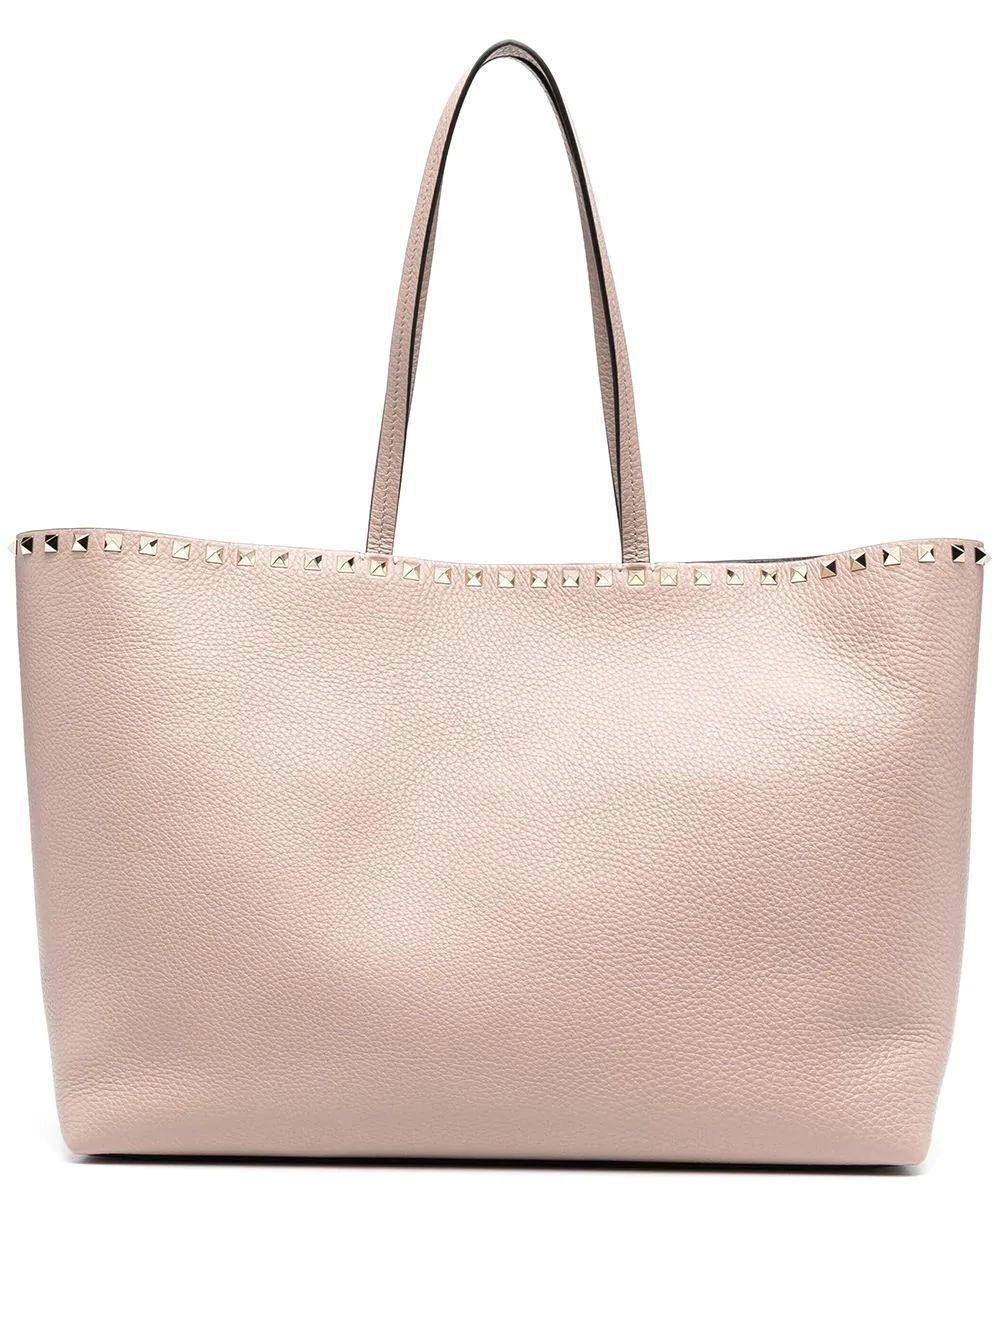 Rockstud Tote Bag